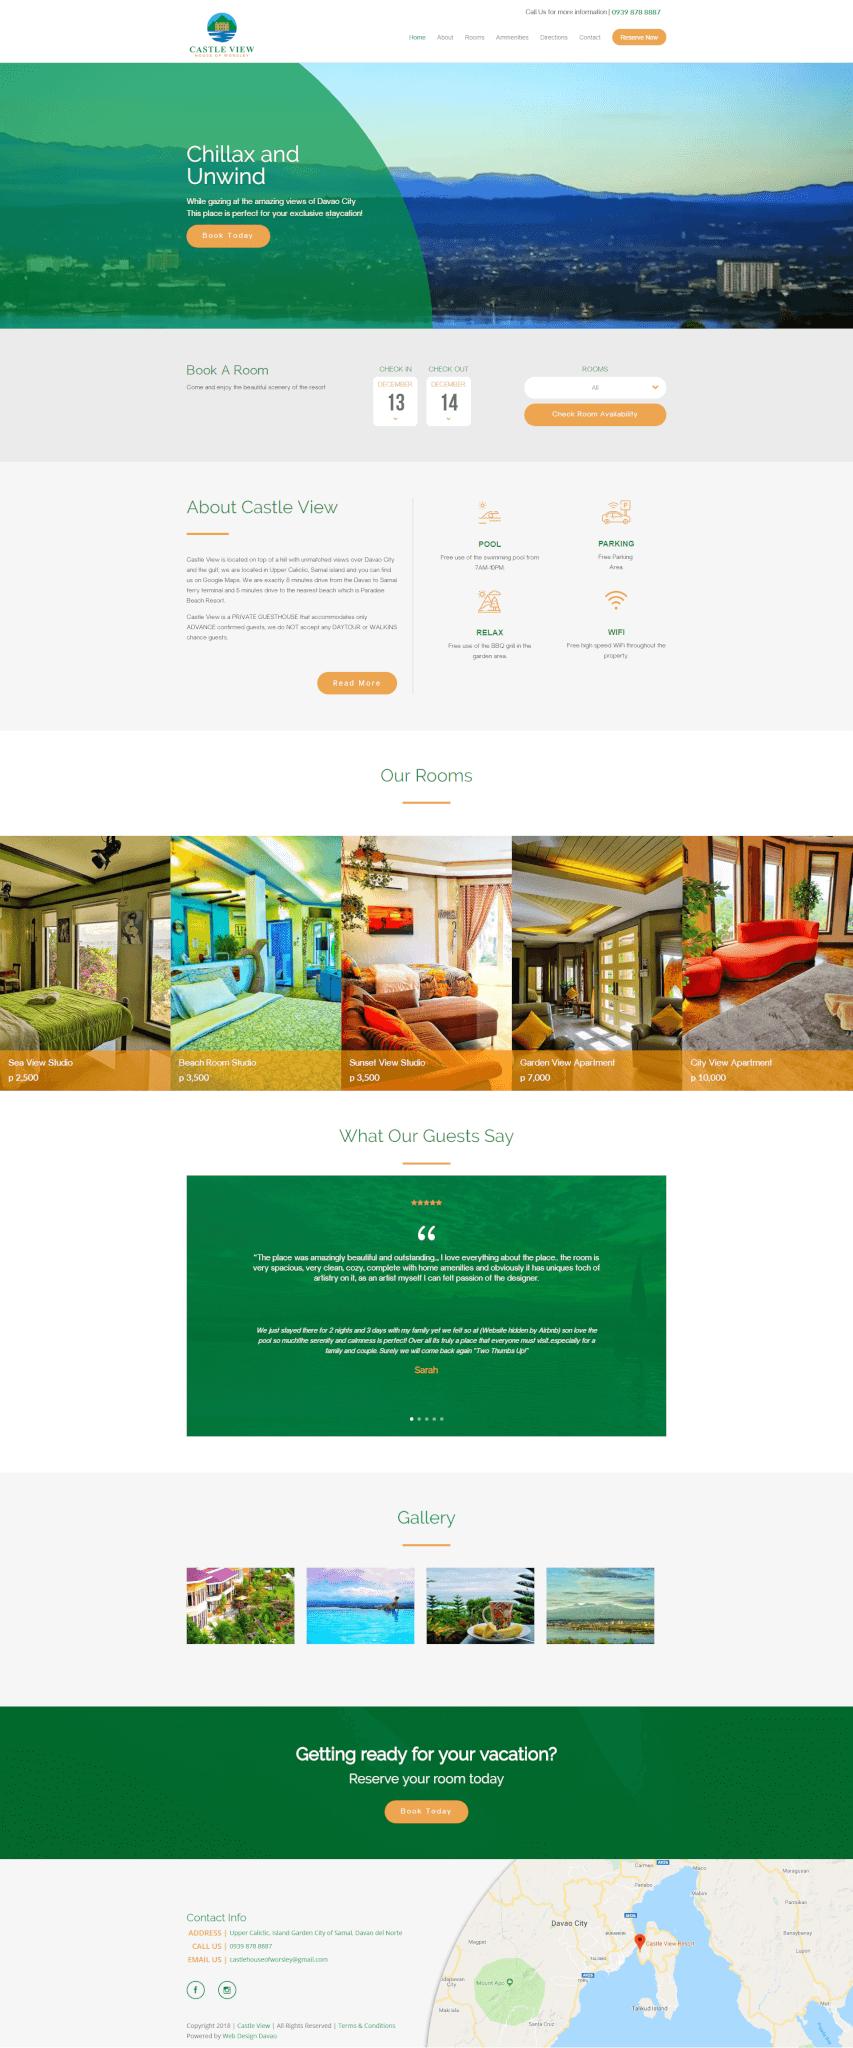 castleviewsamal_homepage